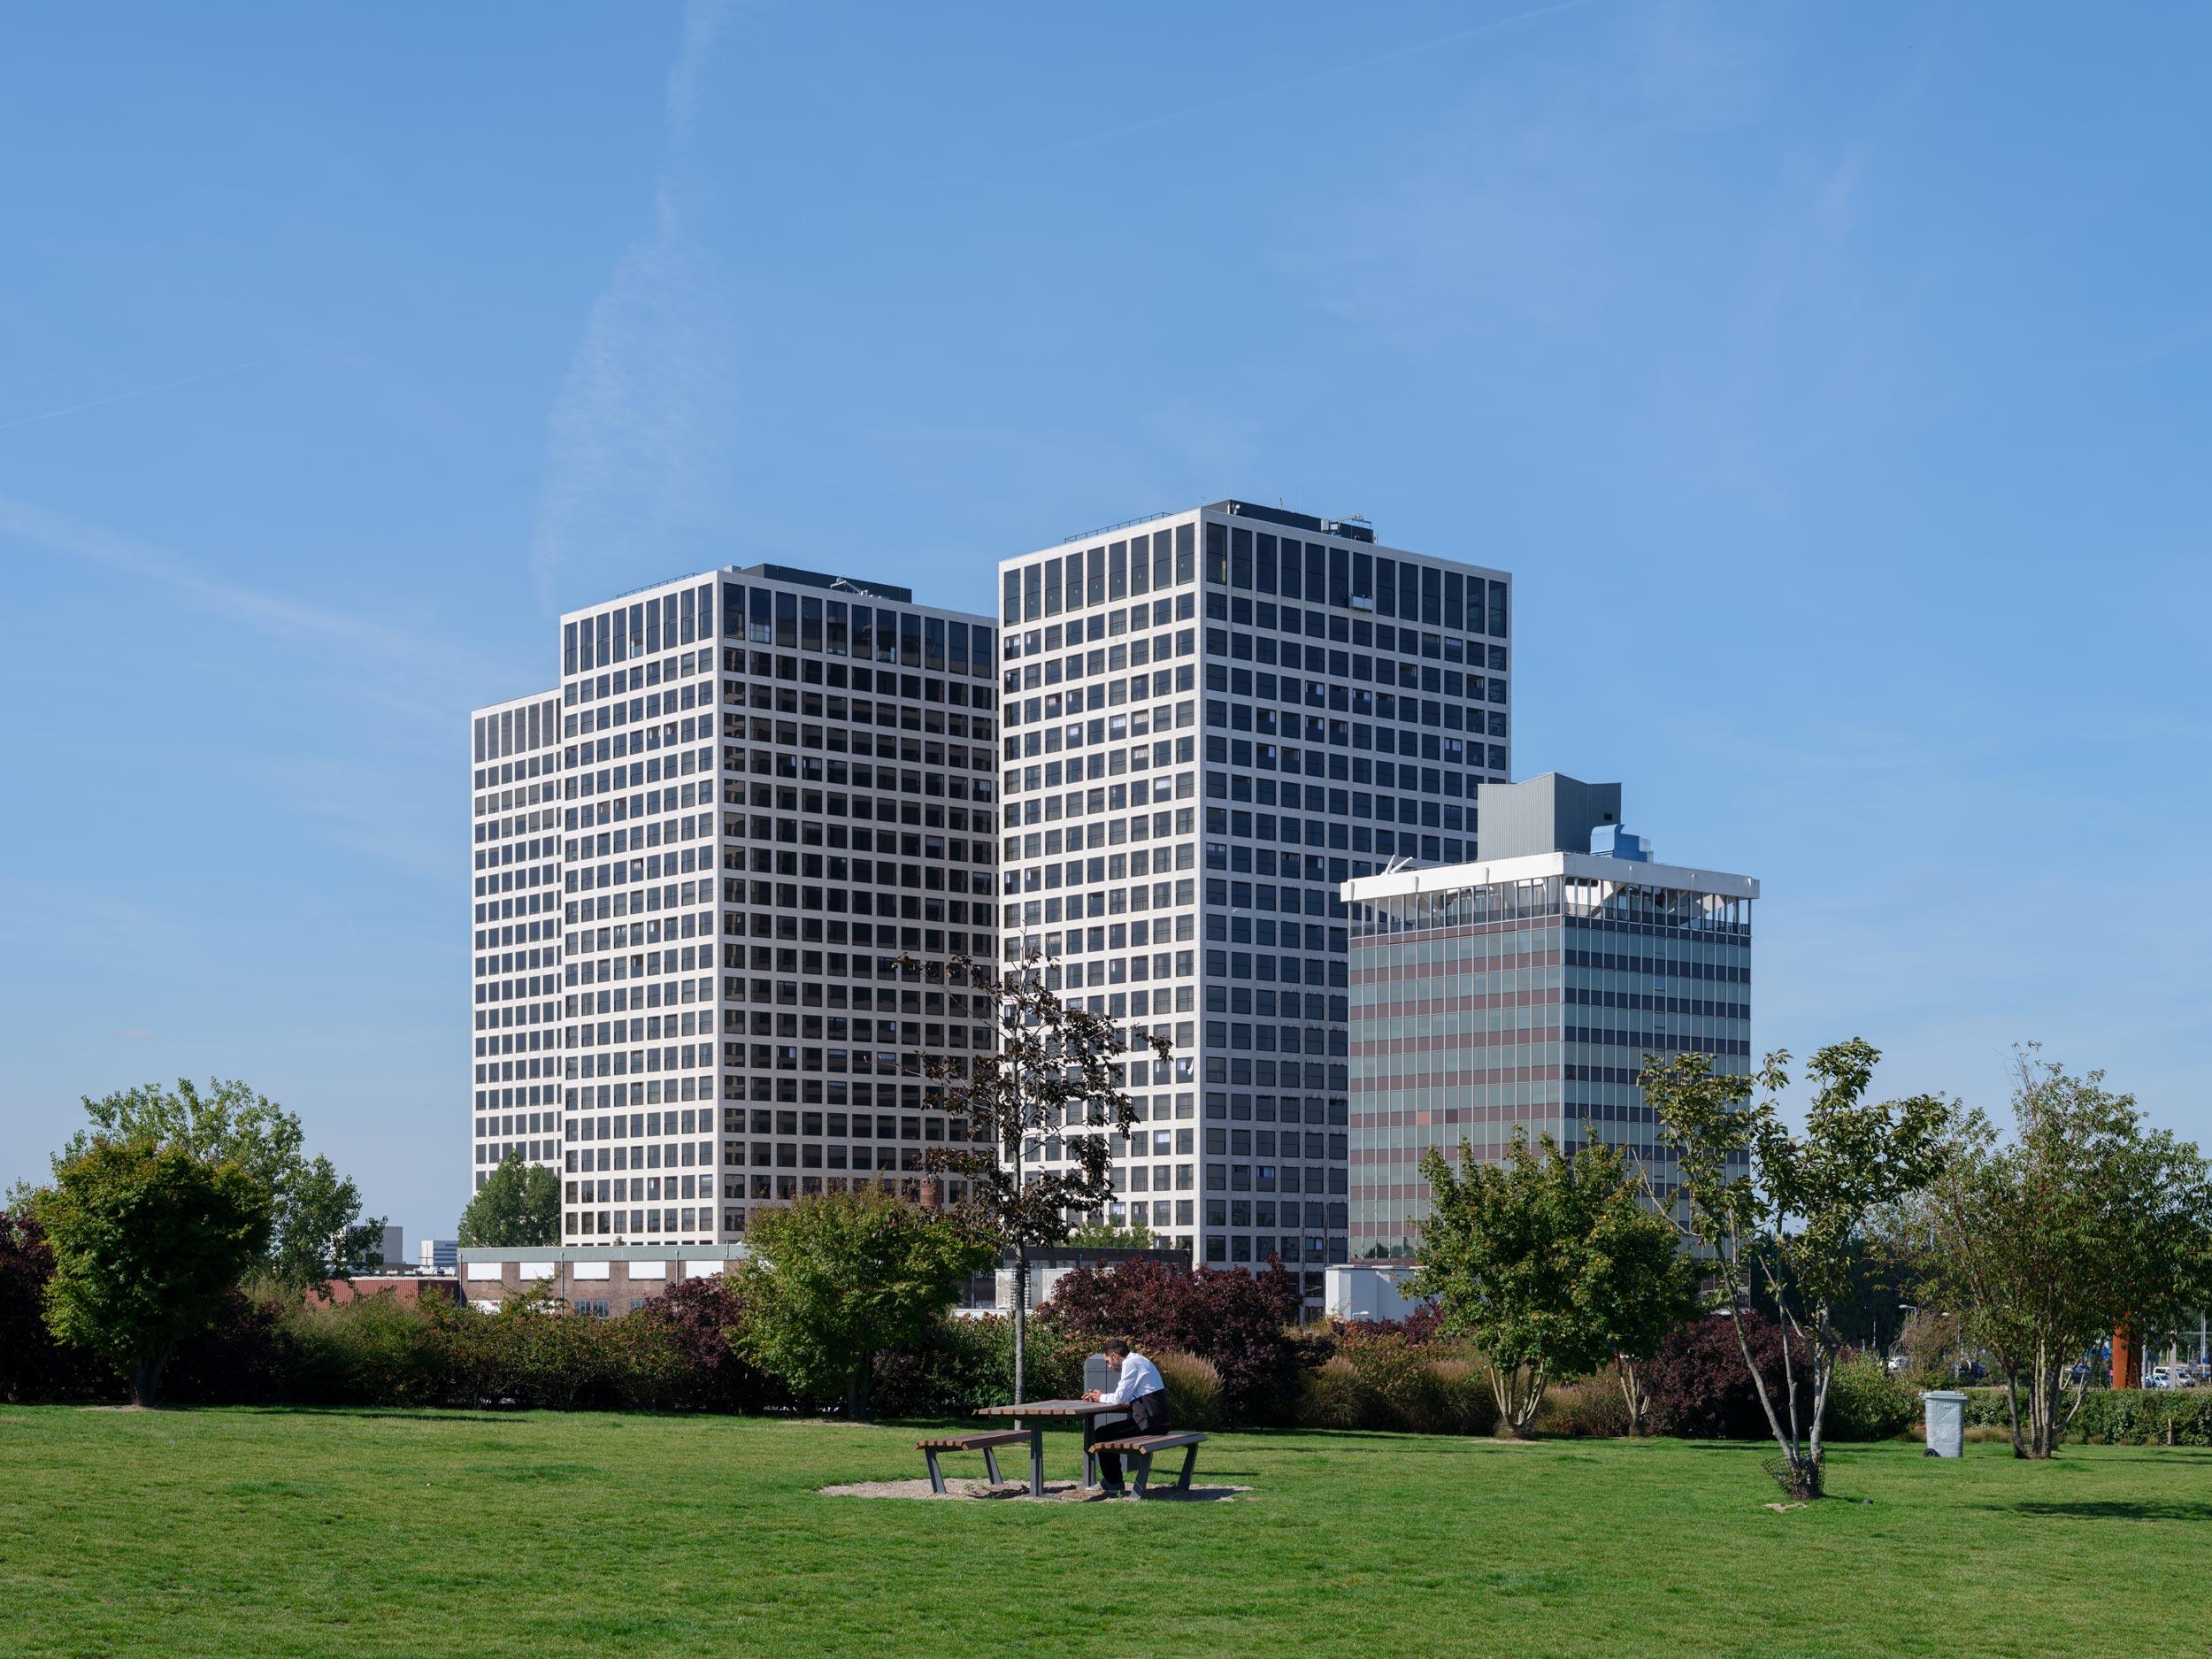 019-VB-Ossip-van-Duivenbode-Lee-Towers